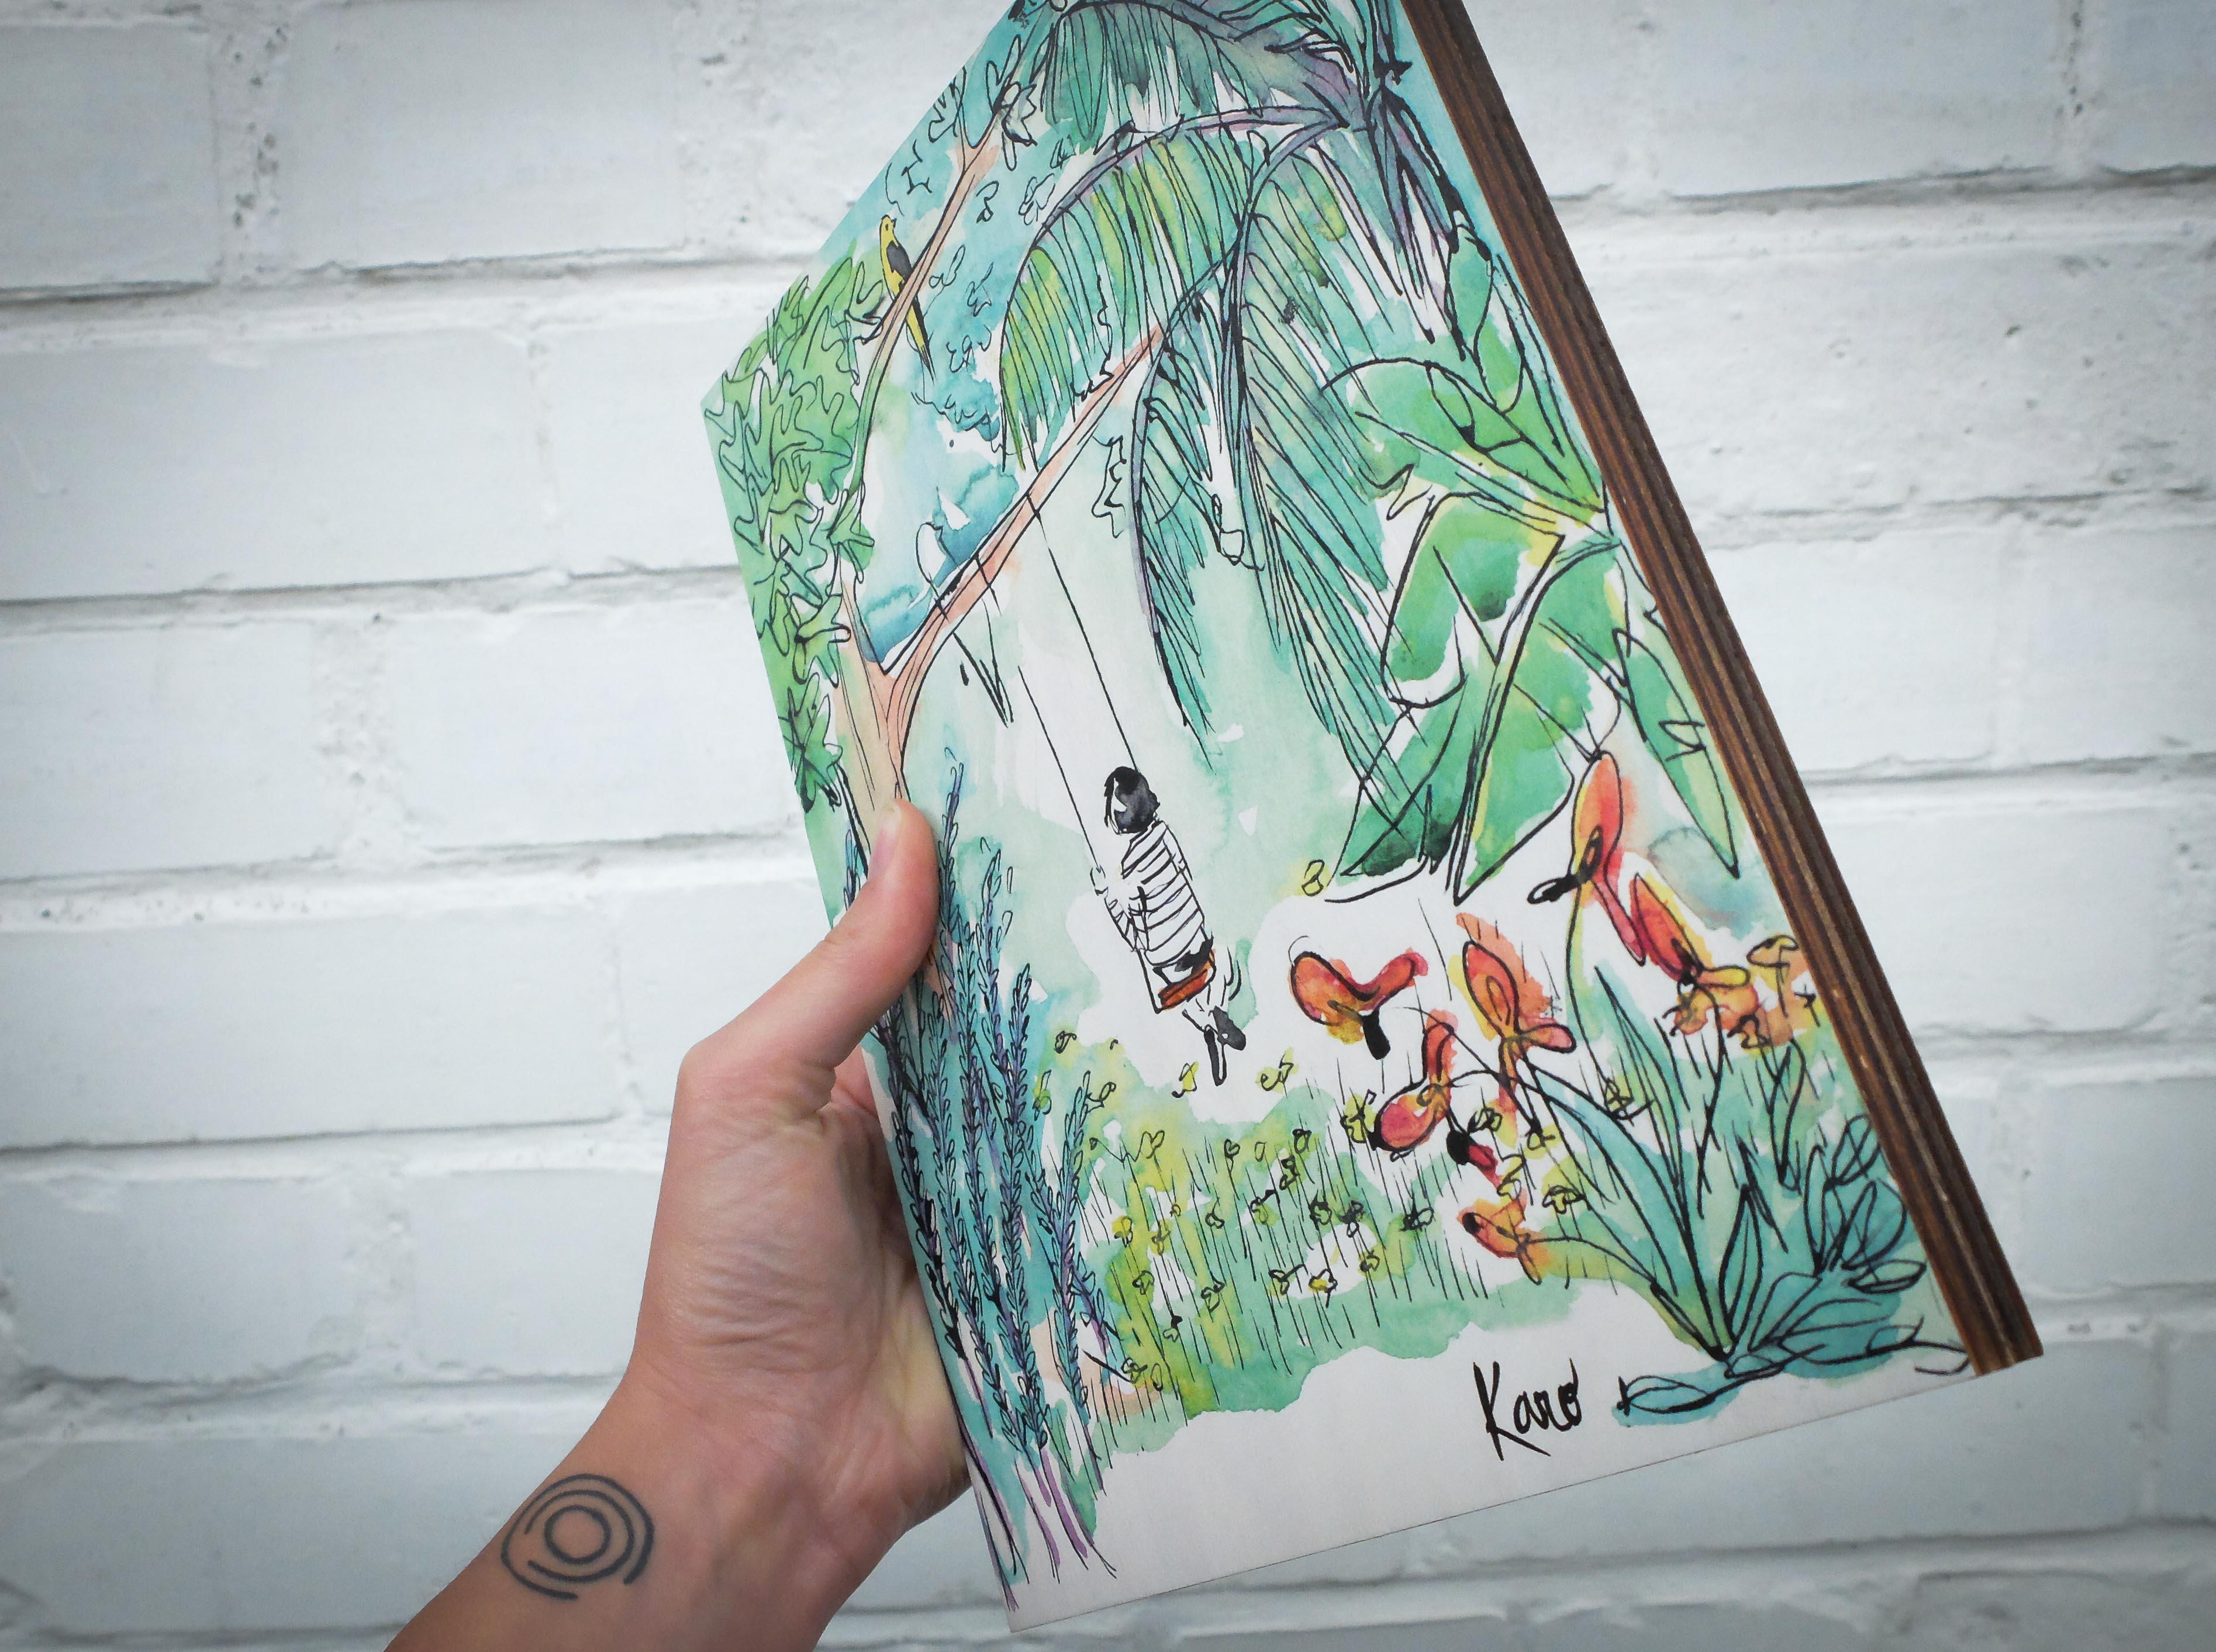 illu_on_the_wood_karopauwels_illustration